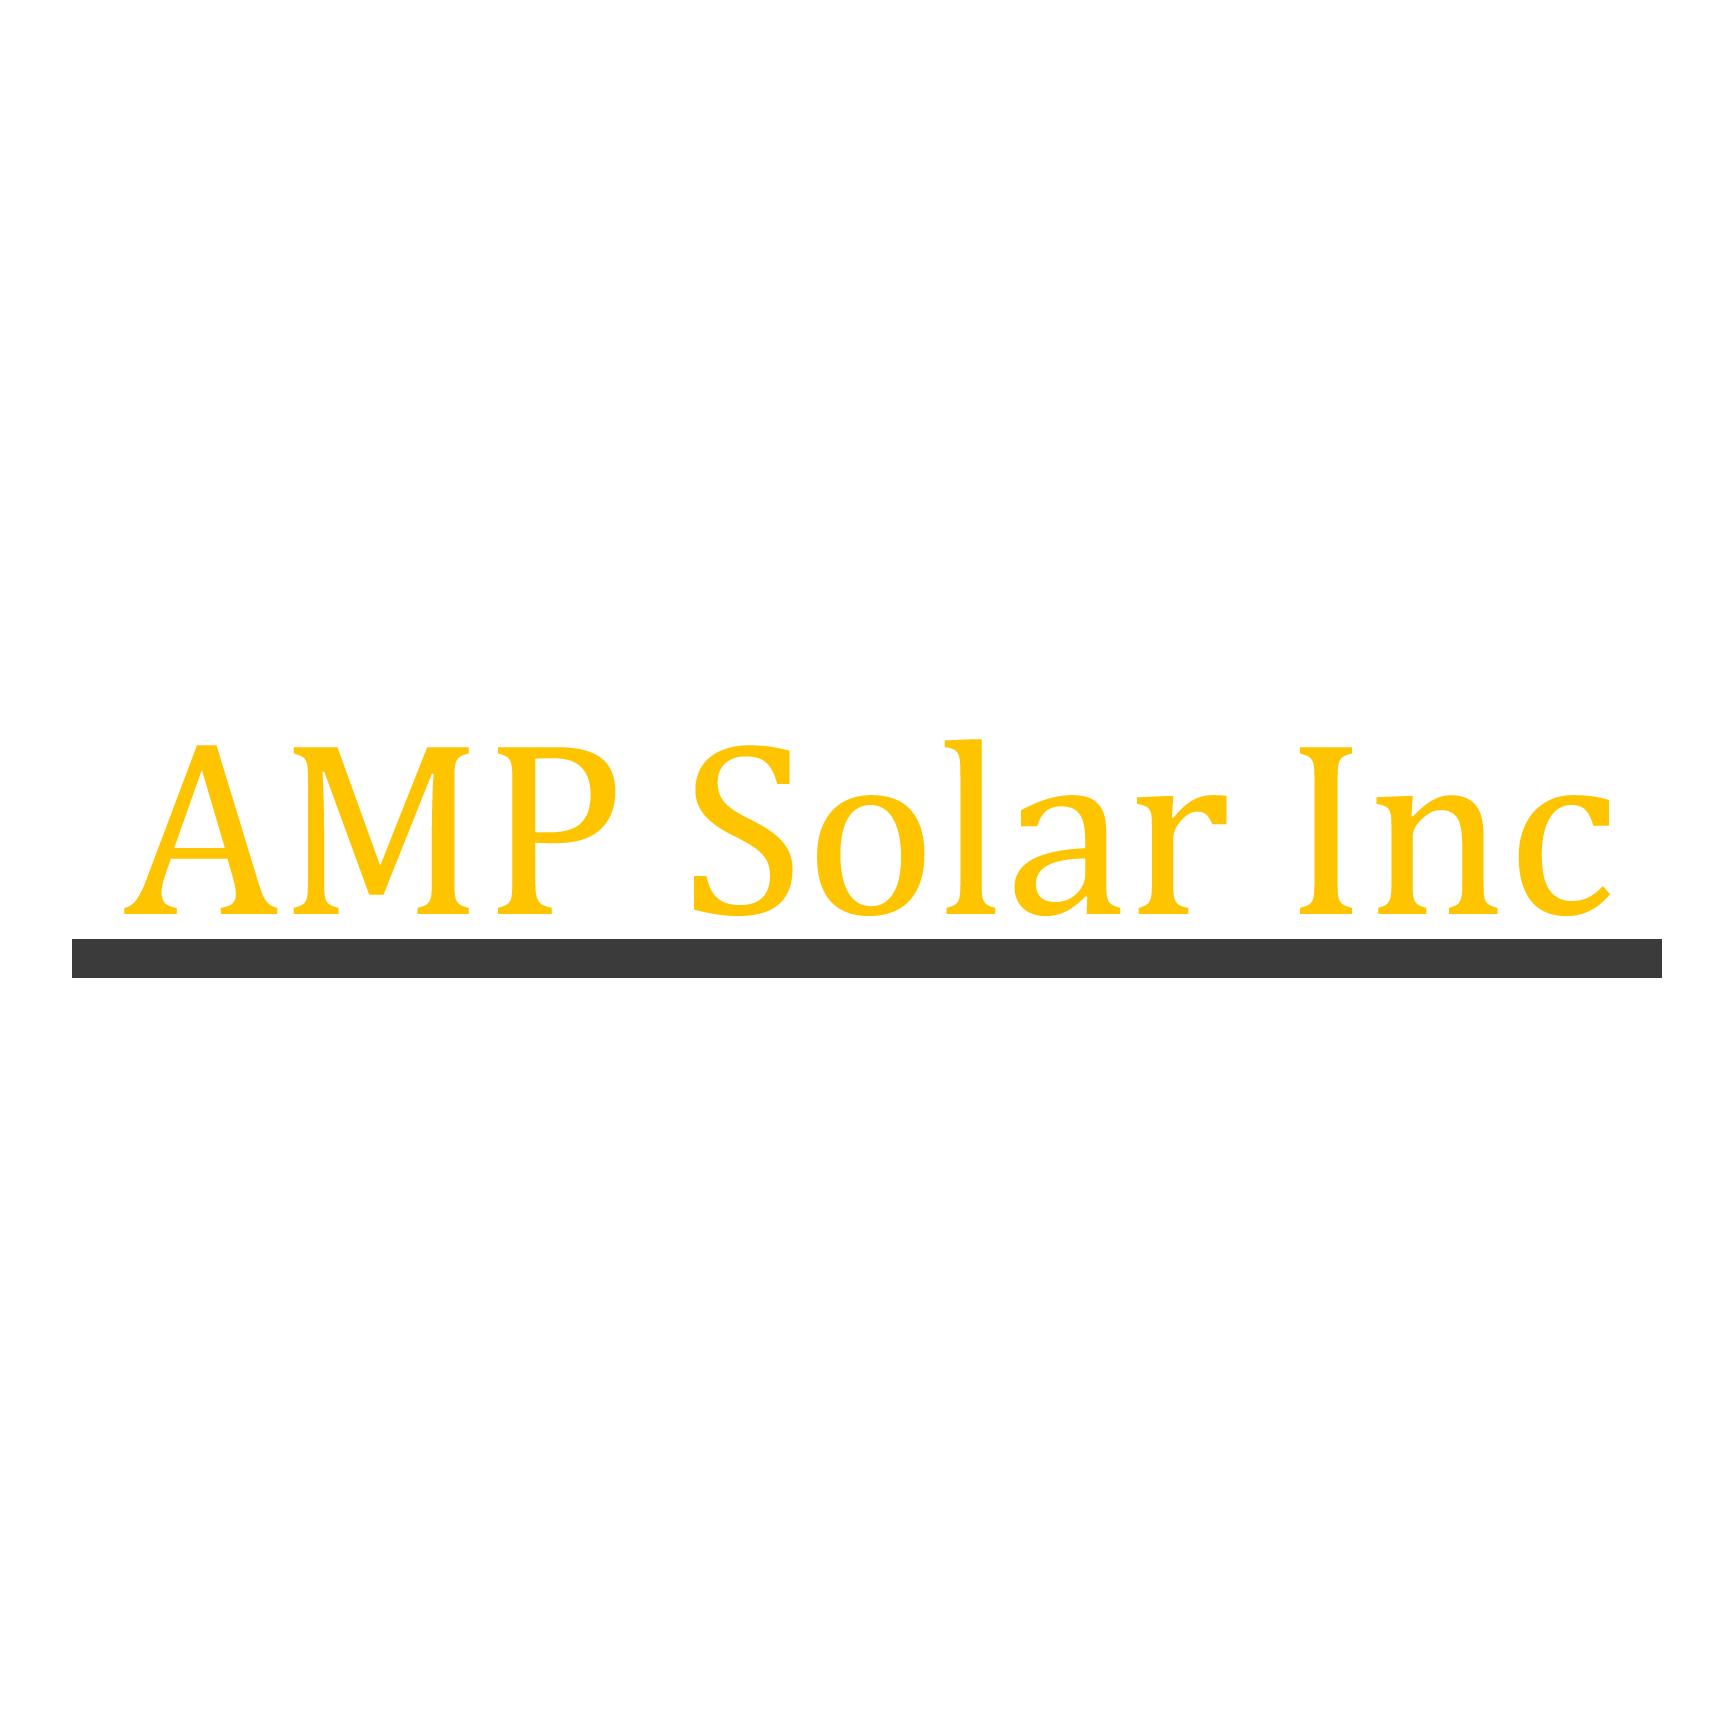 AMP Solar Inc